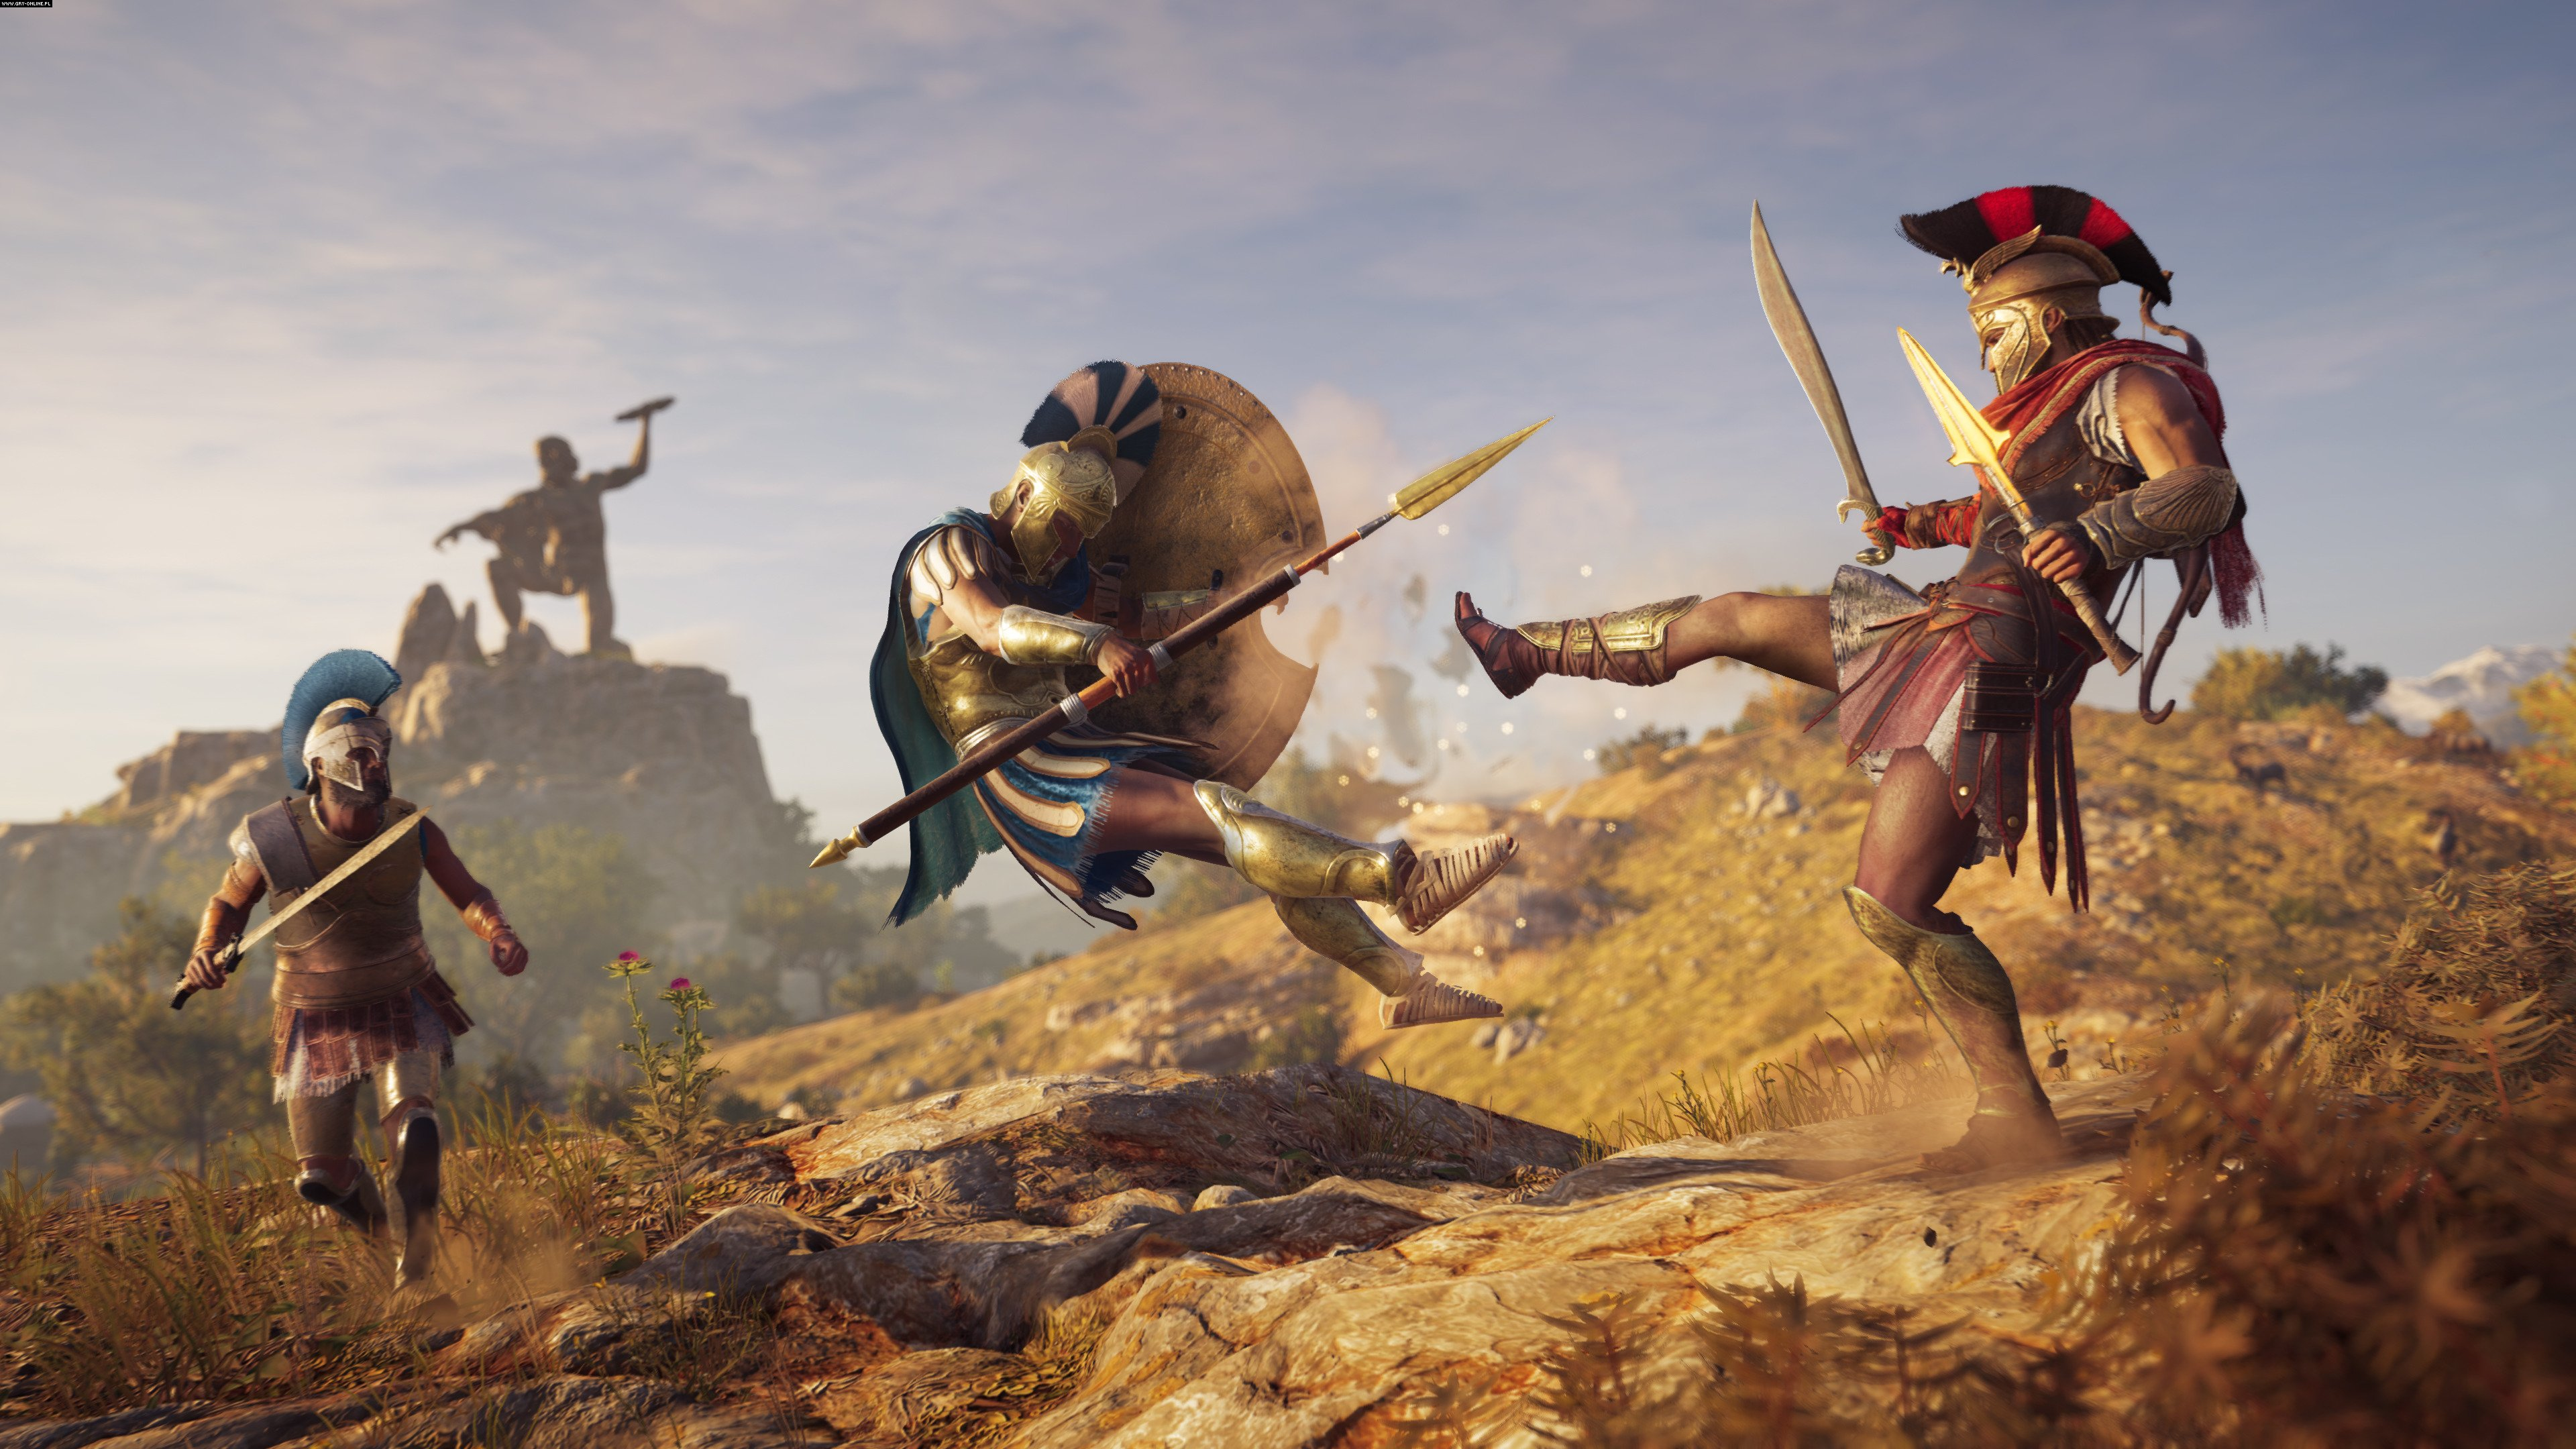 Assassin's Creed Odyssey PC, PS4, XONE Games Image 22/47, Ubisoft